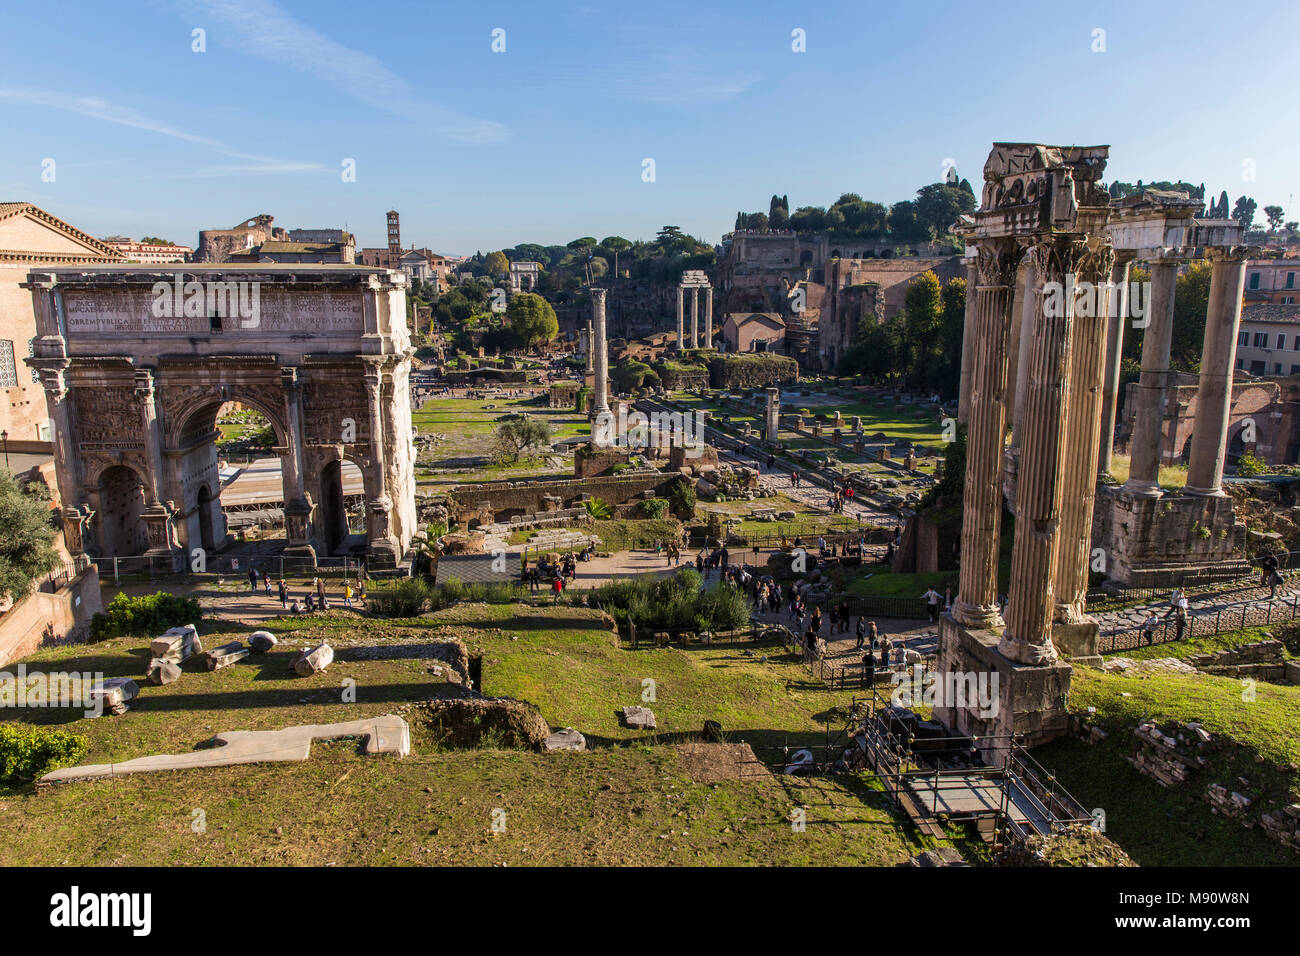 Roman Forum, Rome, Italy. - Stock Image